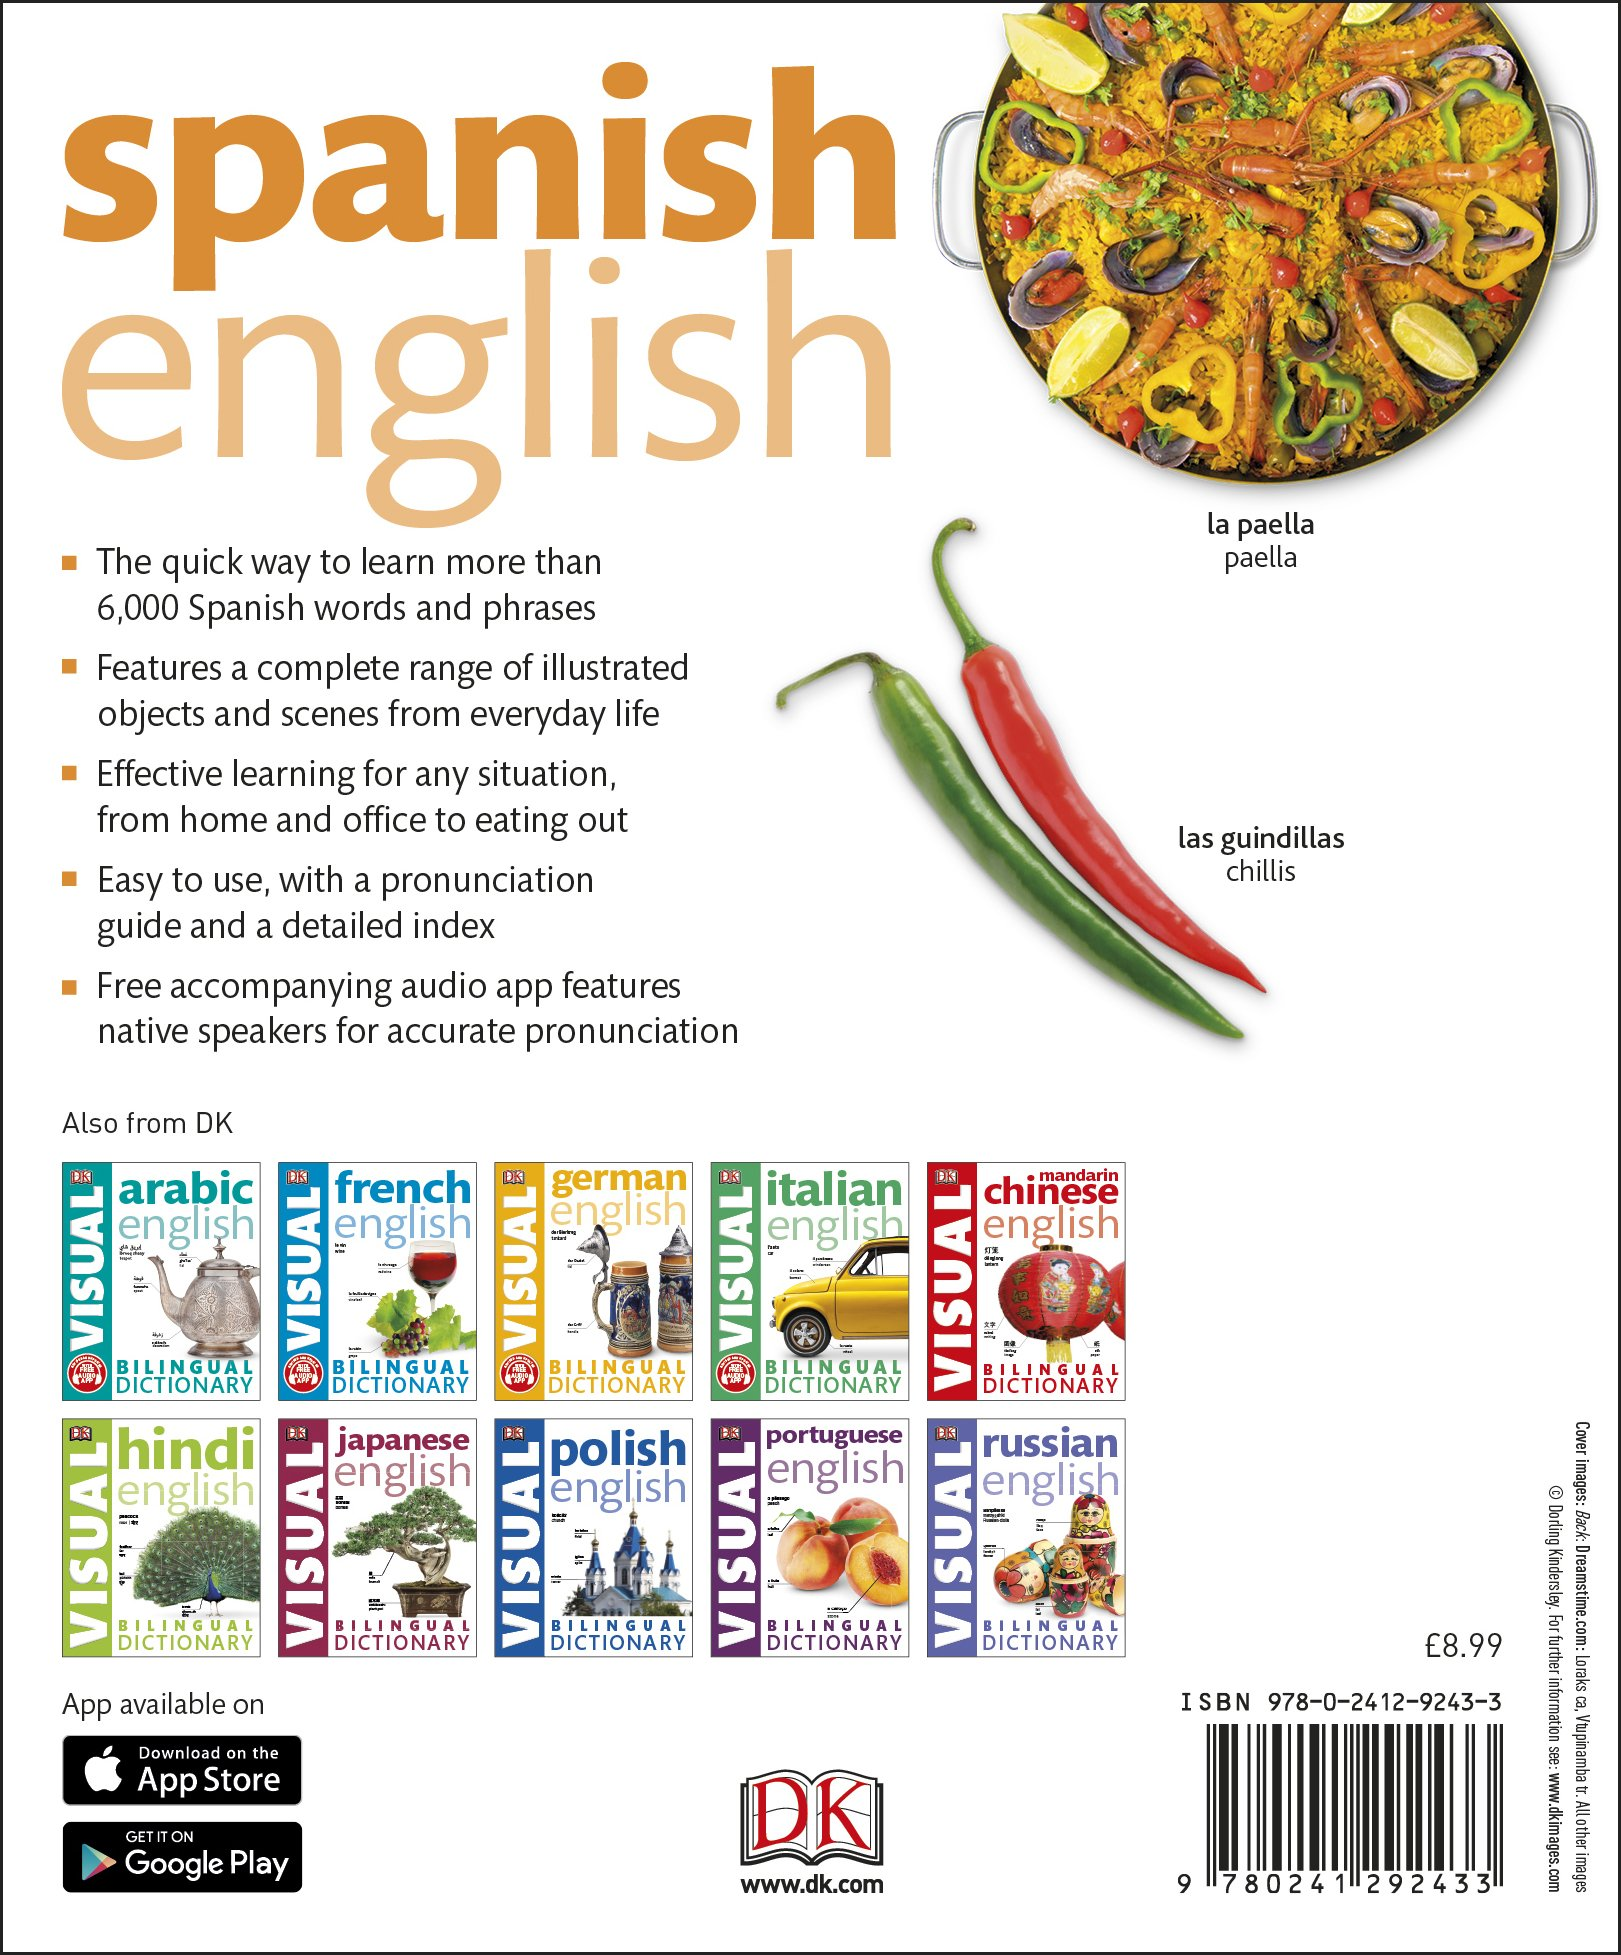 Spanish english bilingual visual dictionary dk bilingual dictionaries amazon co uk dk 9780241292433 books